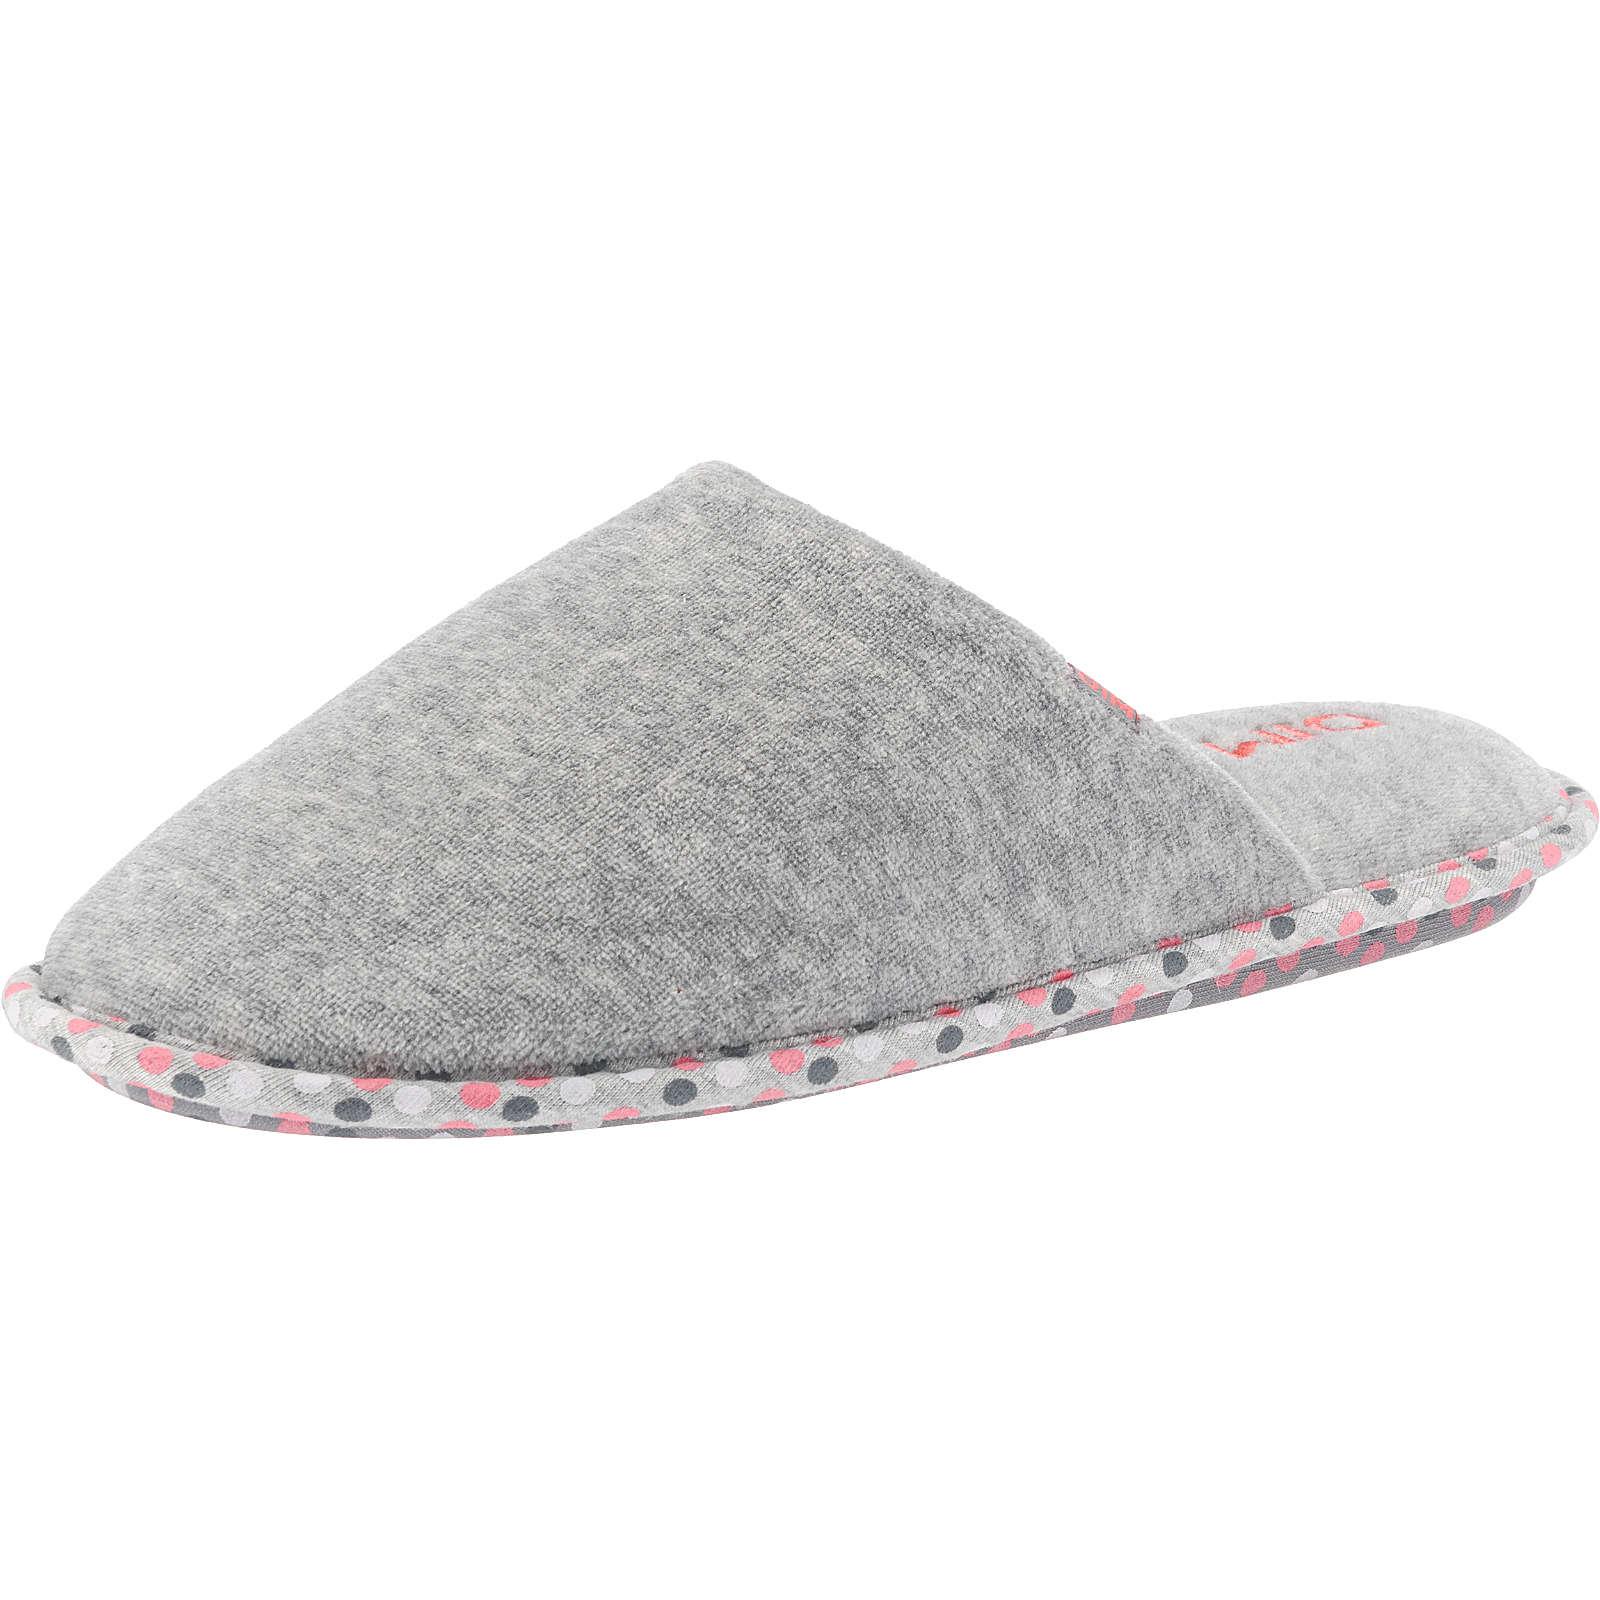 DIM Bader Pantoffeln grau Damen Gr. 36